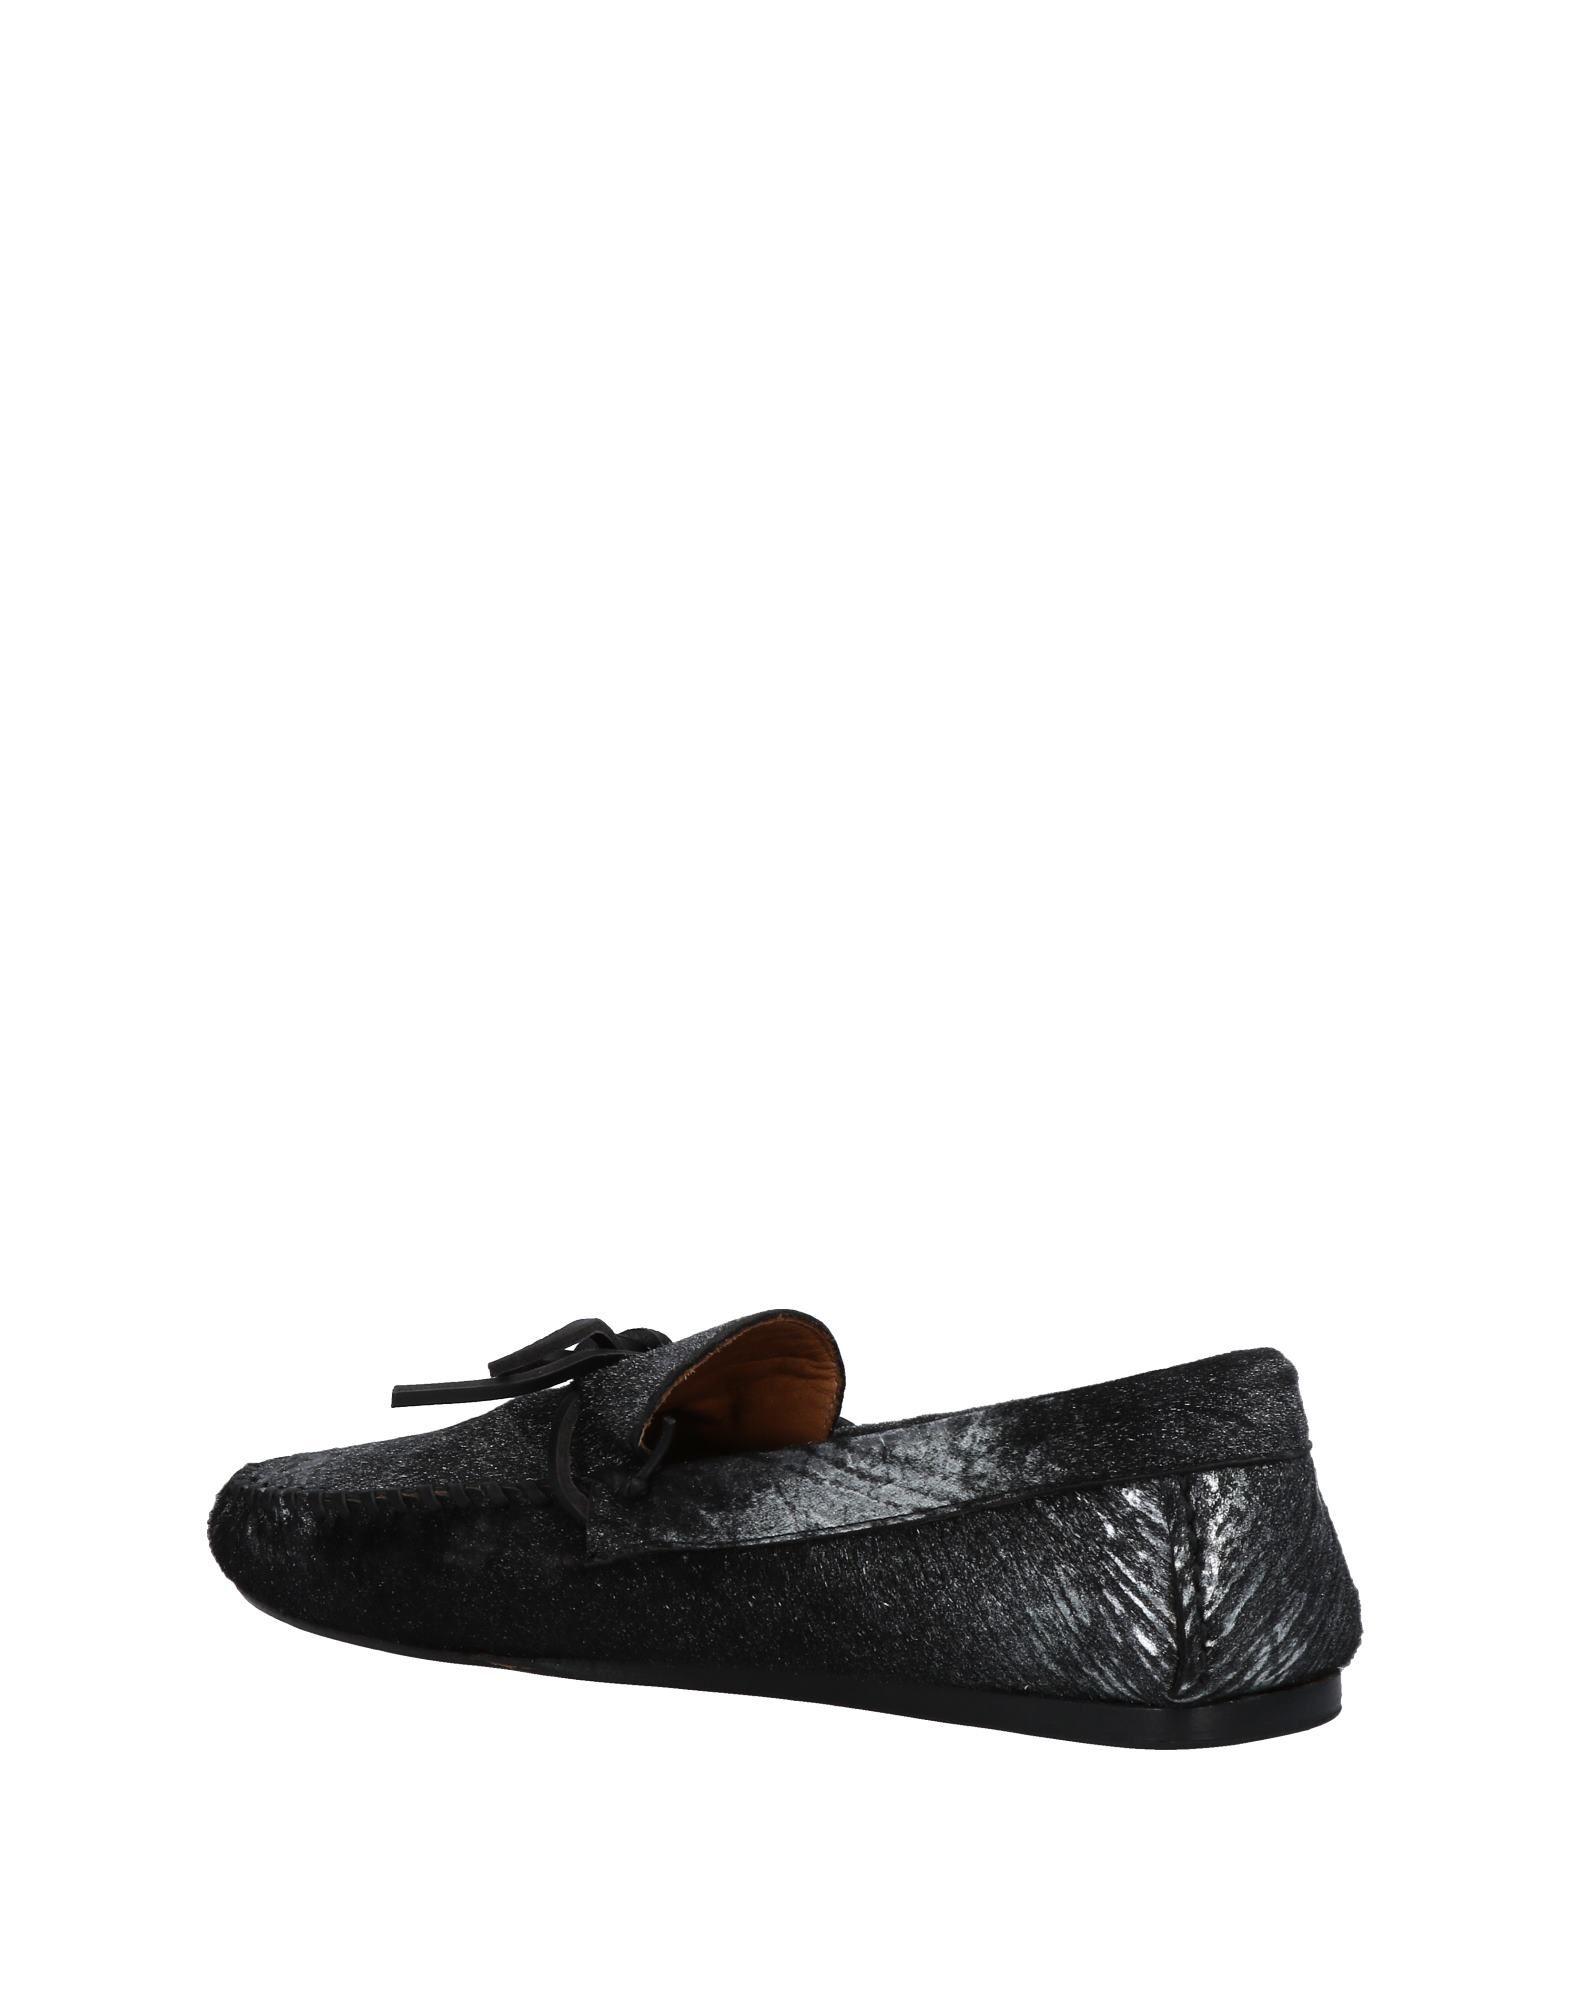 Isabel Marant 11002355TBGut Étoile Mokassins Damen  11002355TBGut Marant aussehende strapazierfähige Schuhe 0d0e8d